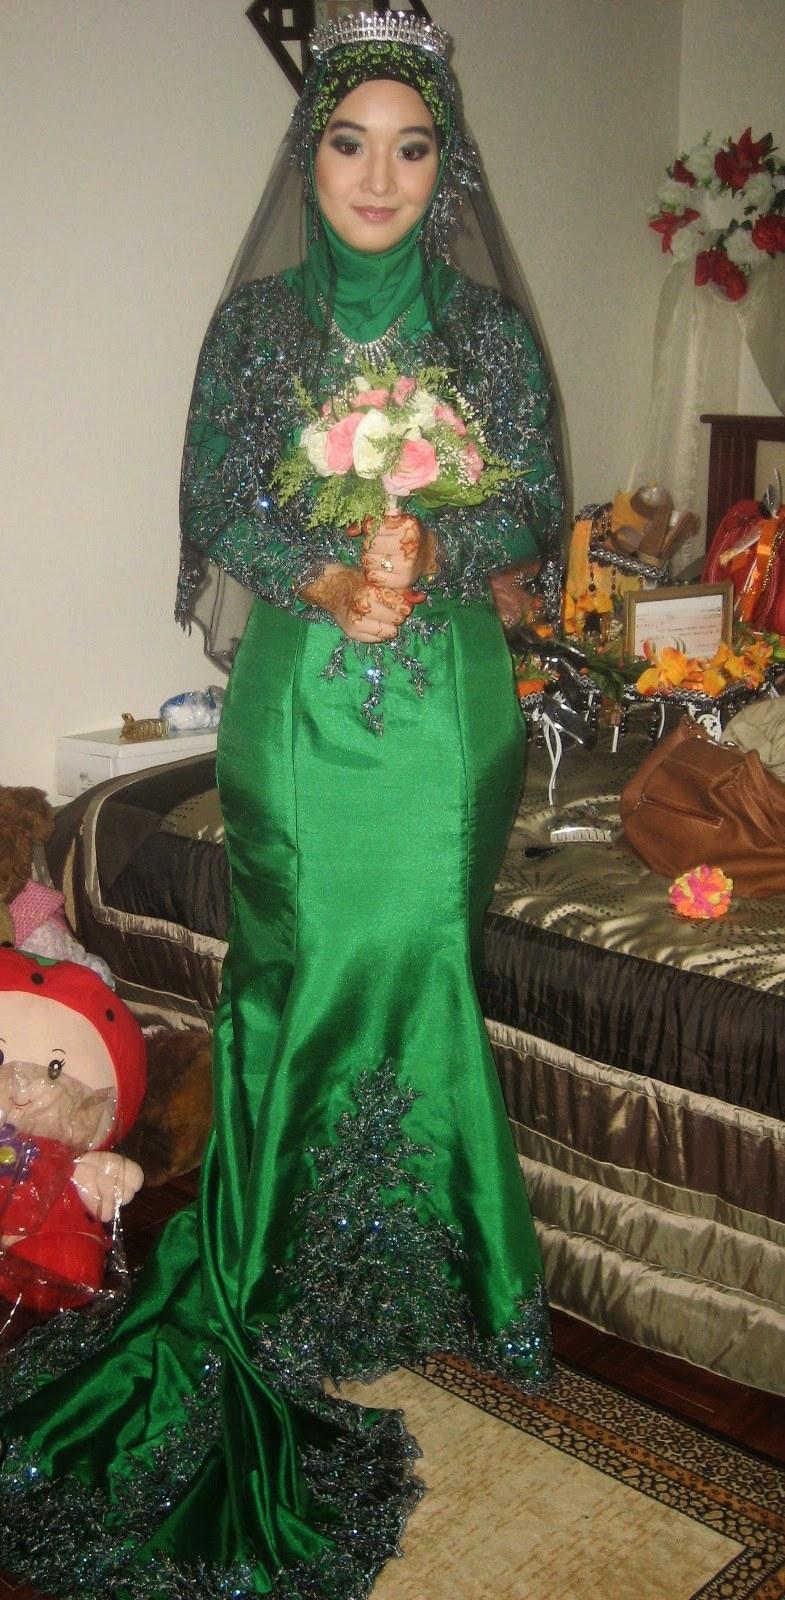 Ide Contoh Baju Pengantin Muslimah Wddj Baju Gamis Hijau